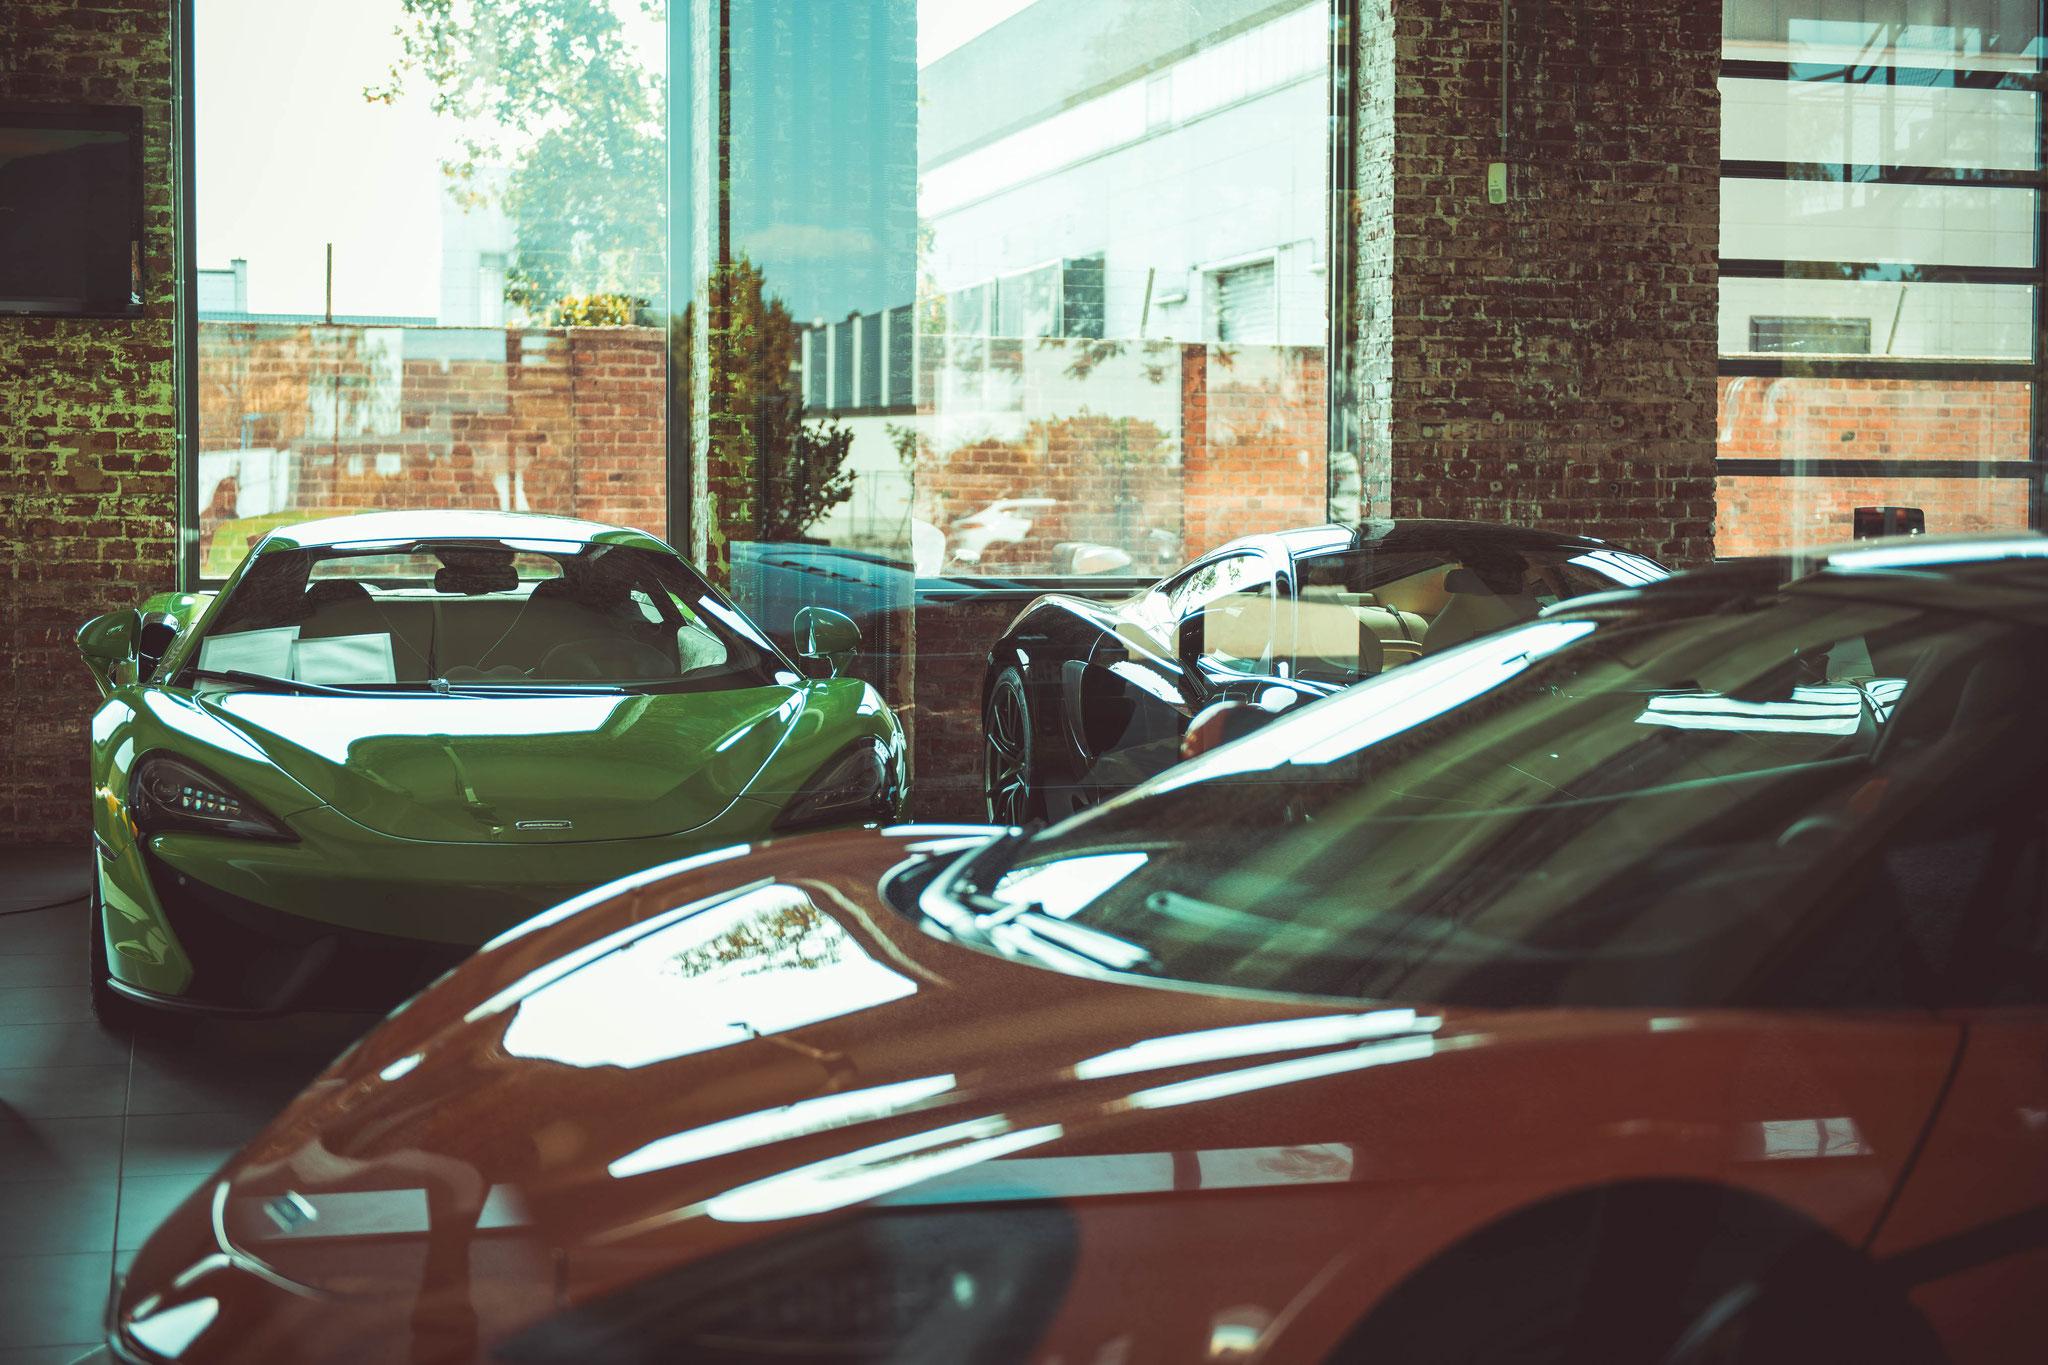 Bugatti und Lamborghini Autohaus in Frnakfurt